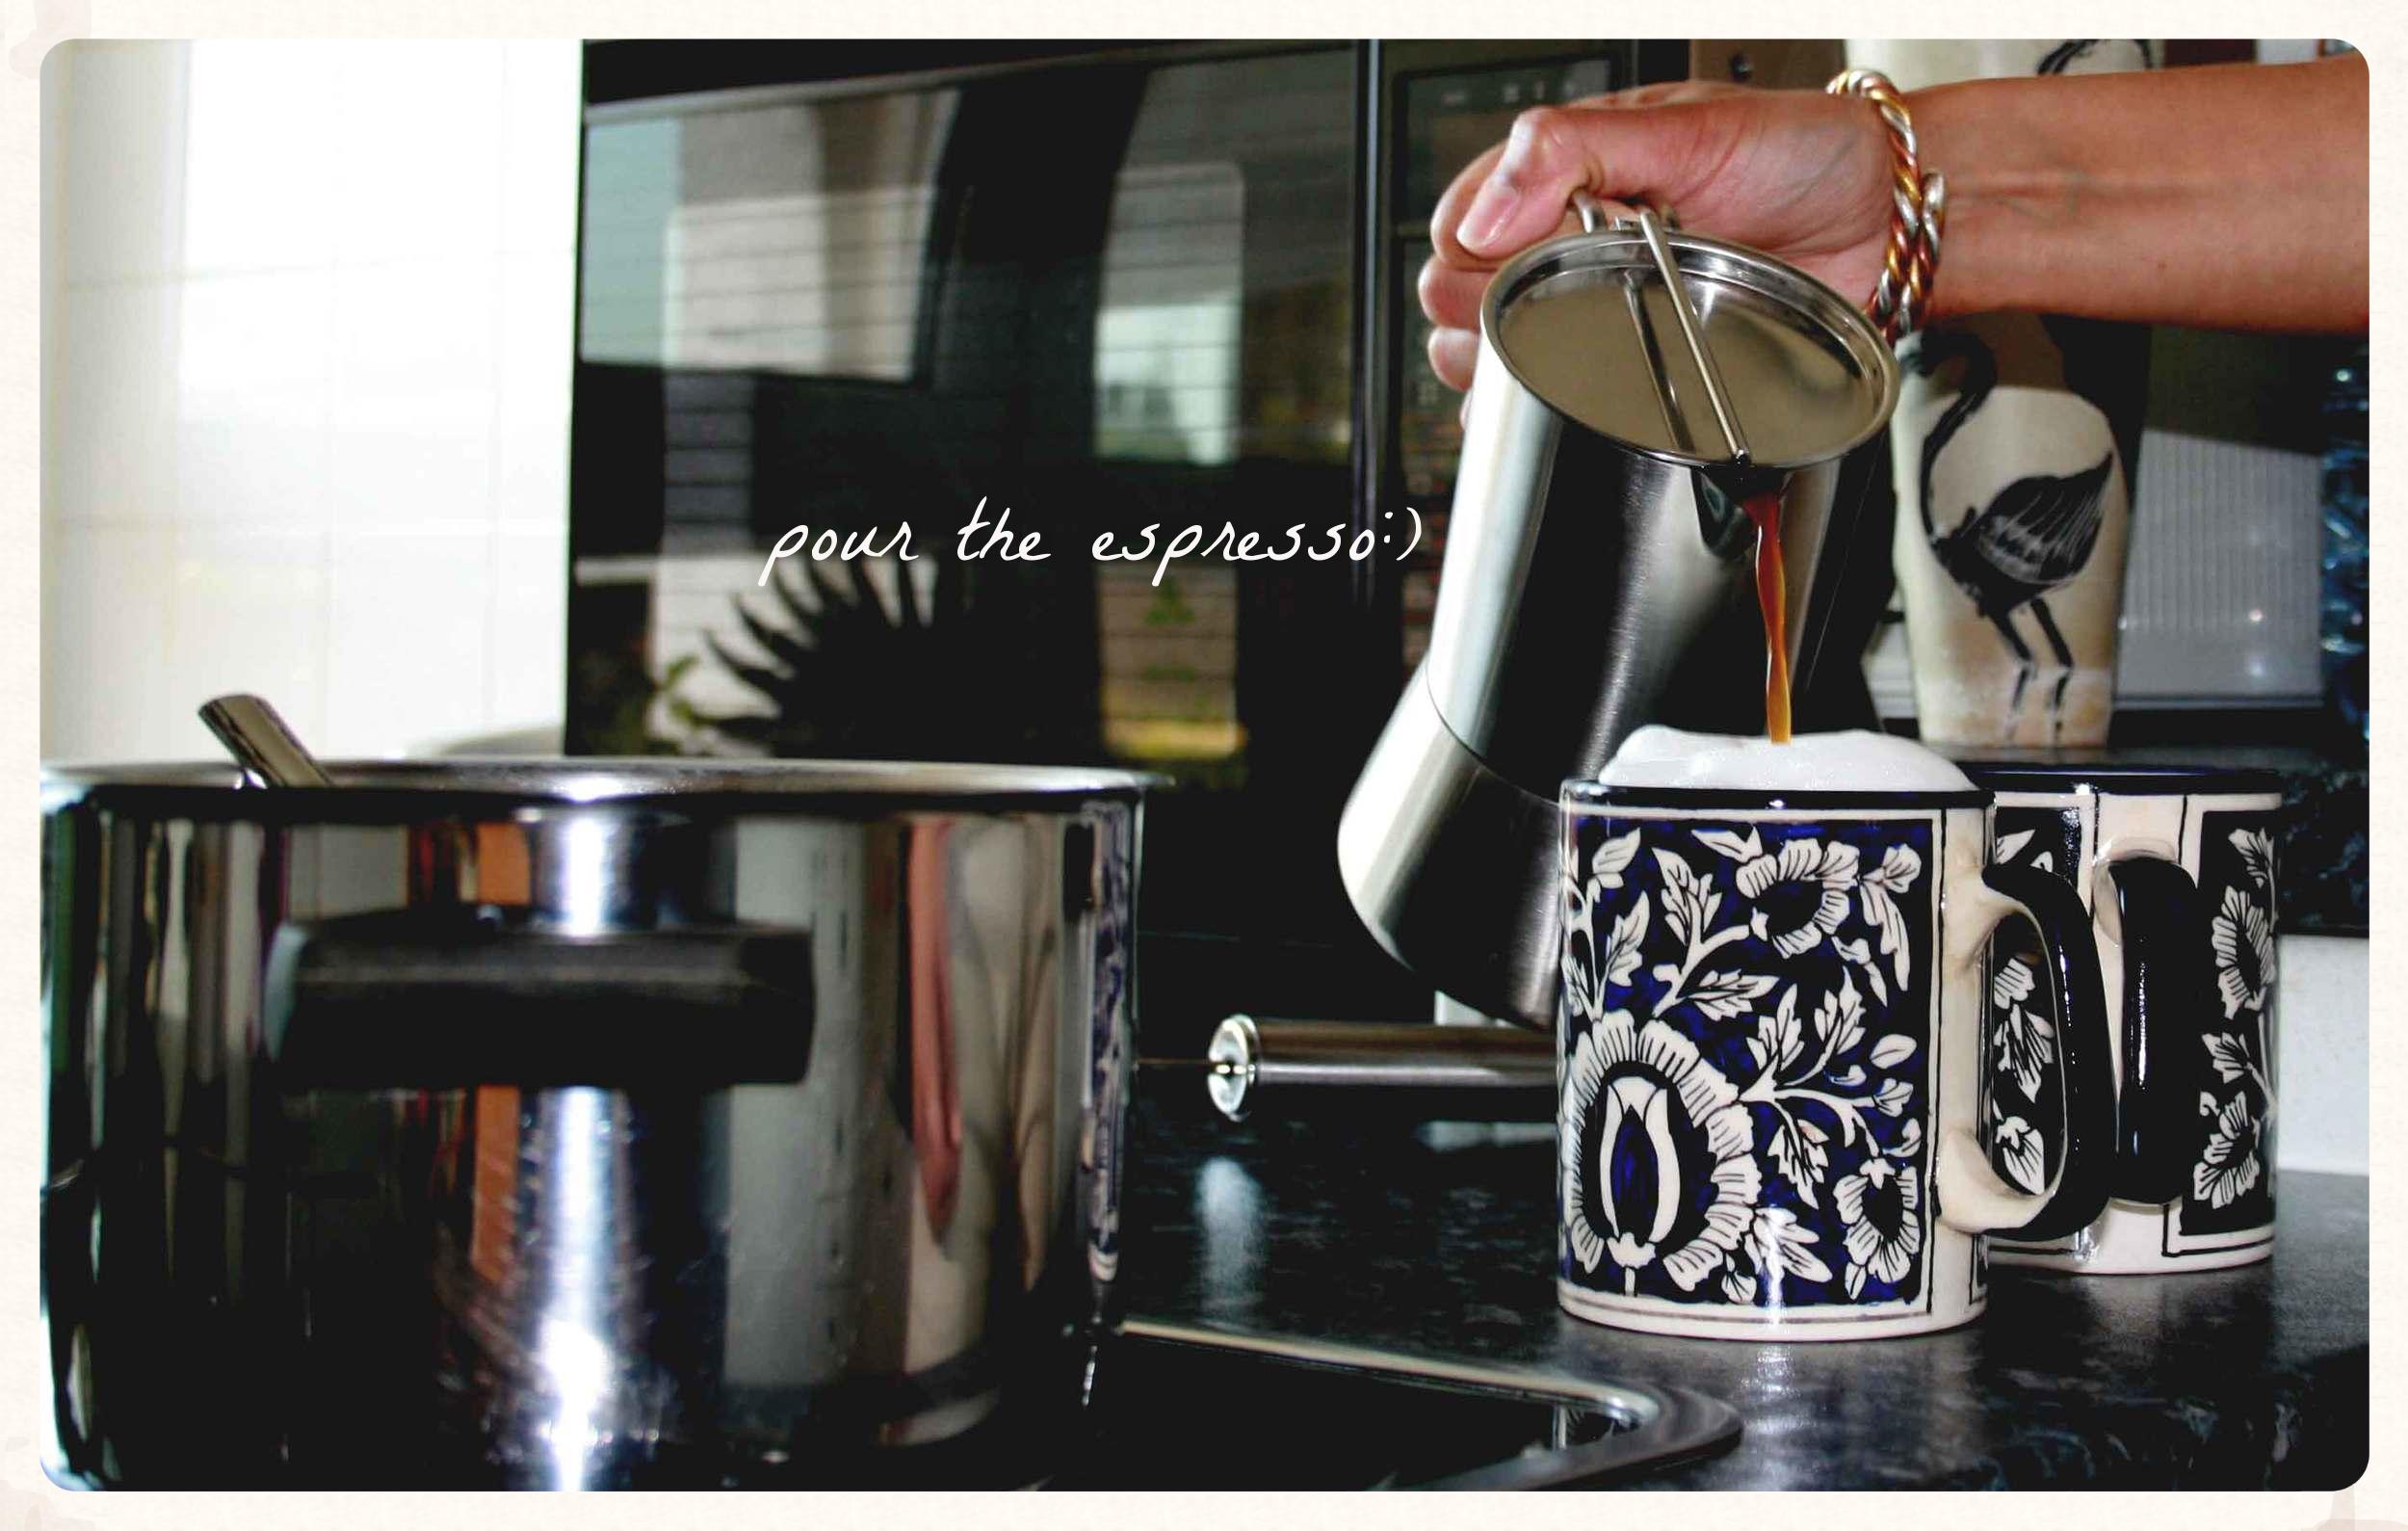 Adding espresso to milk and froth for a perfect cappuccino. Image©gunjanvirk